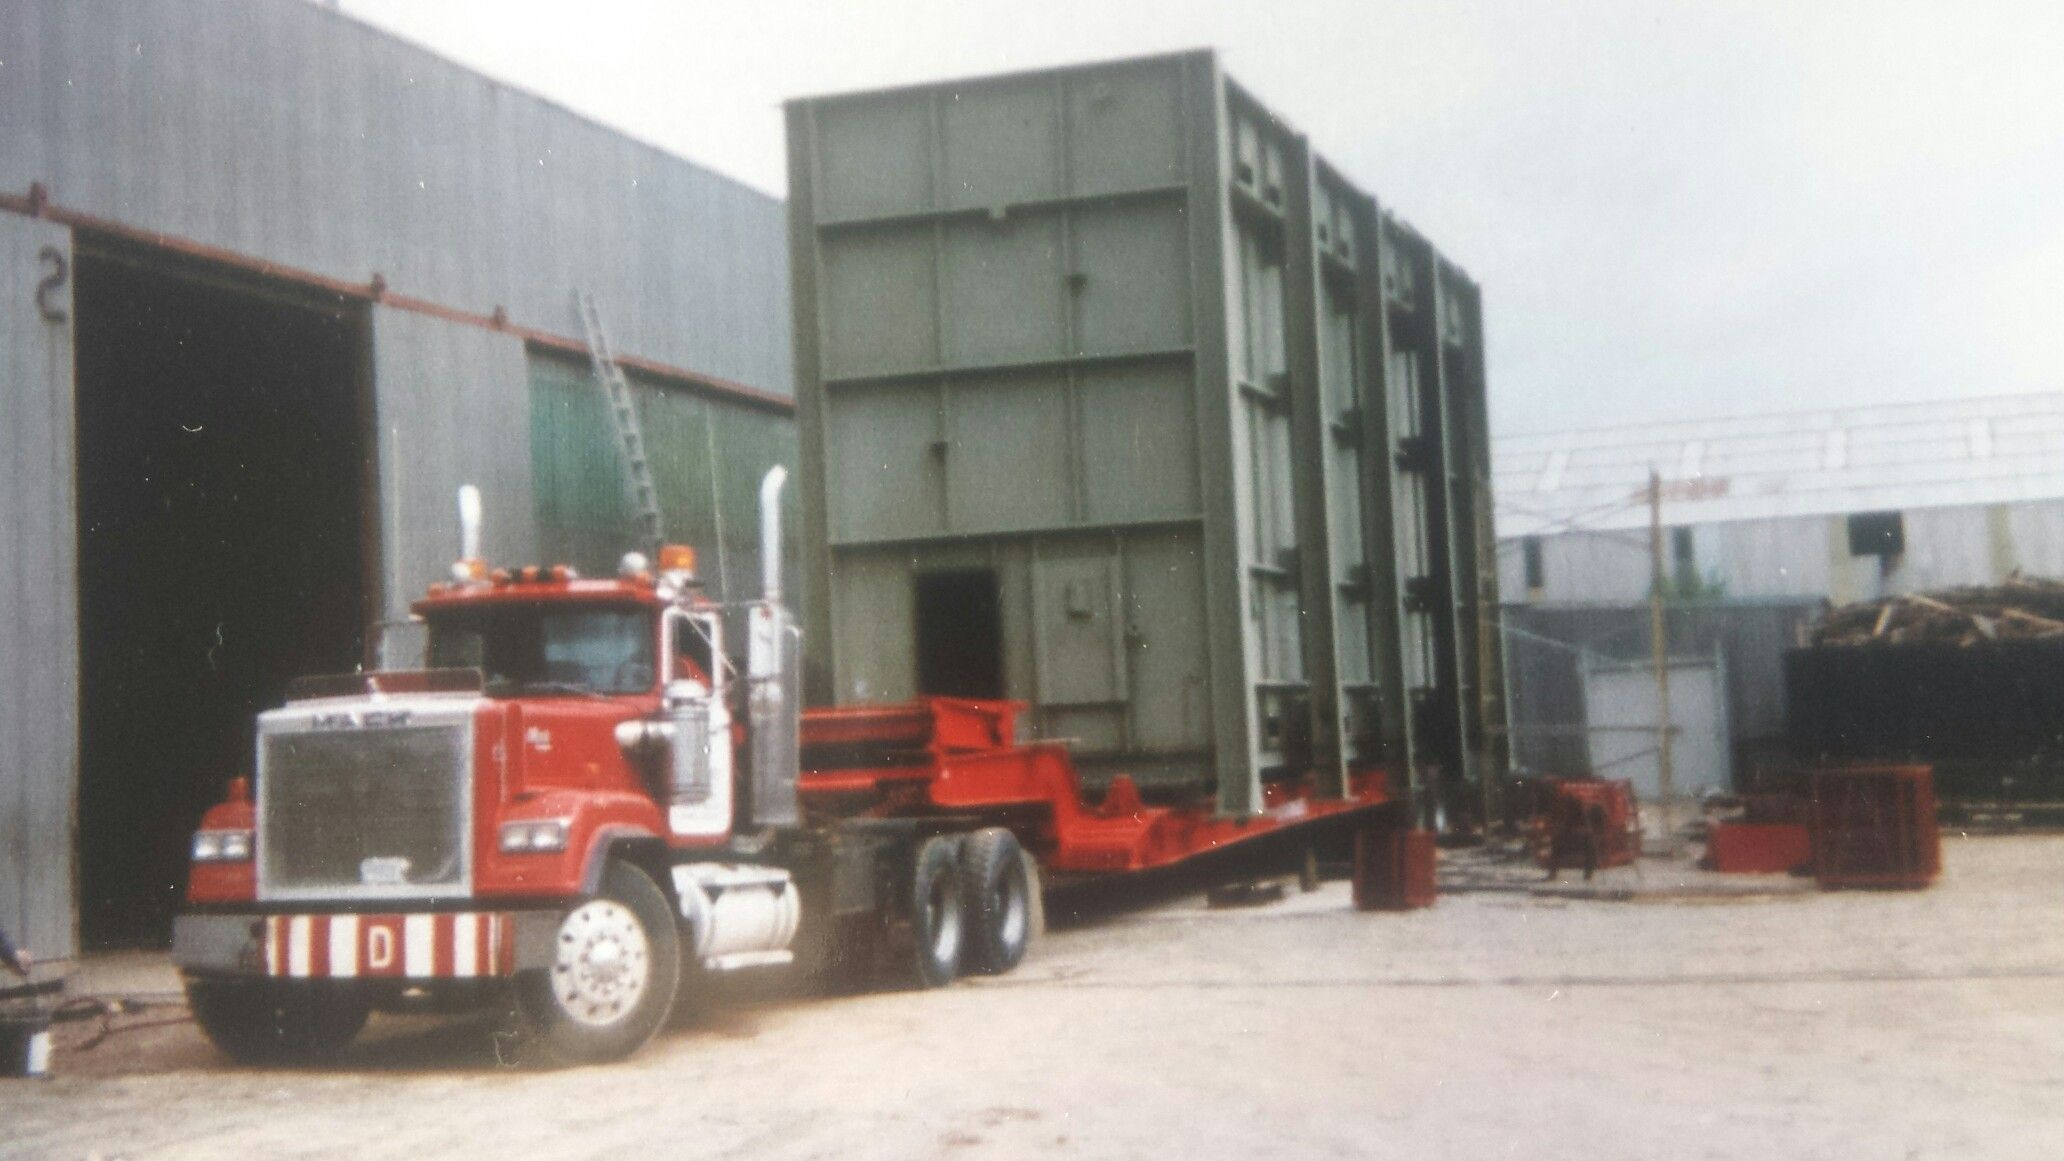 Original mamoet Calgary to dow chemical ft sask 1992